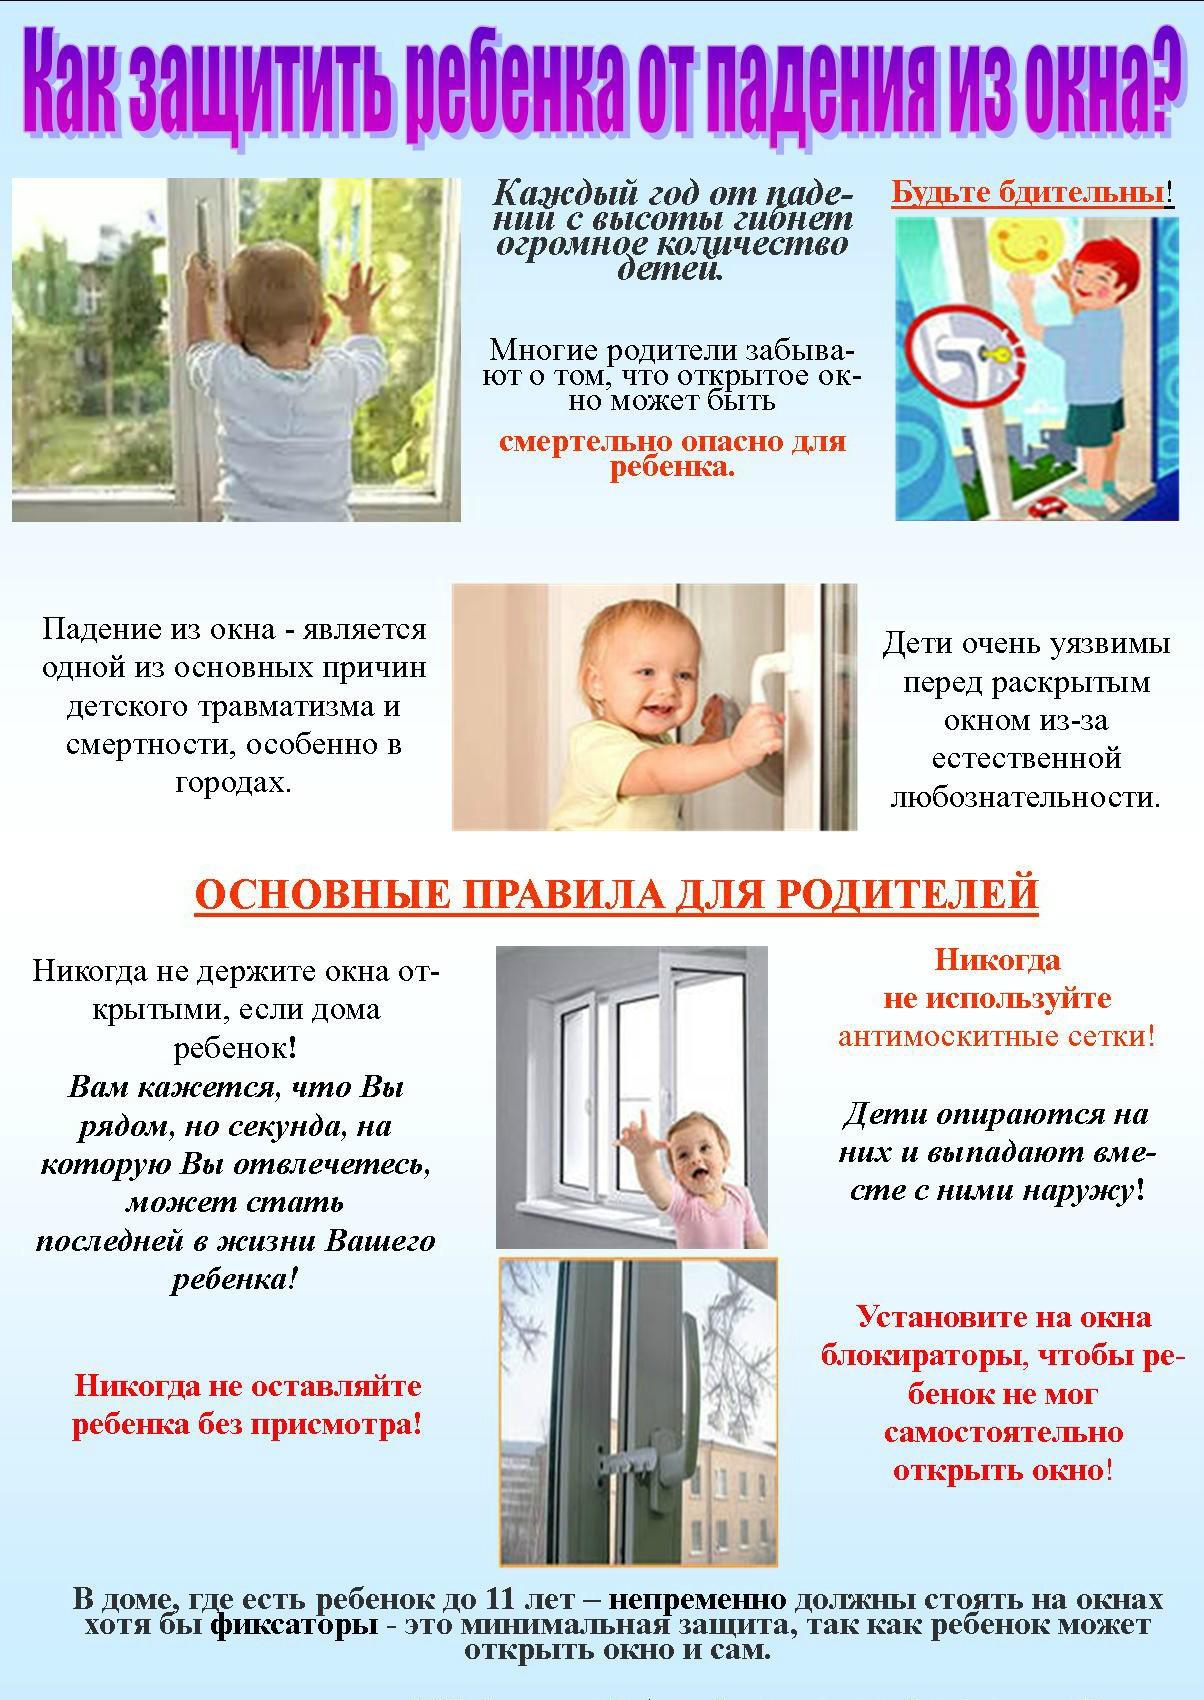 http://sovjkh.by/wp-content/uploads/2016/08/plakat.jpg